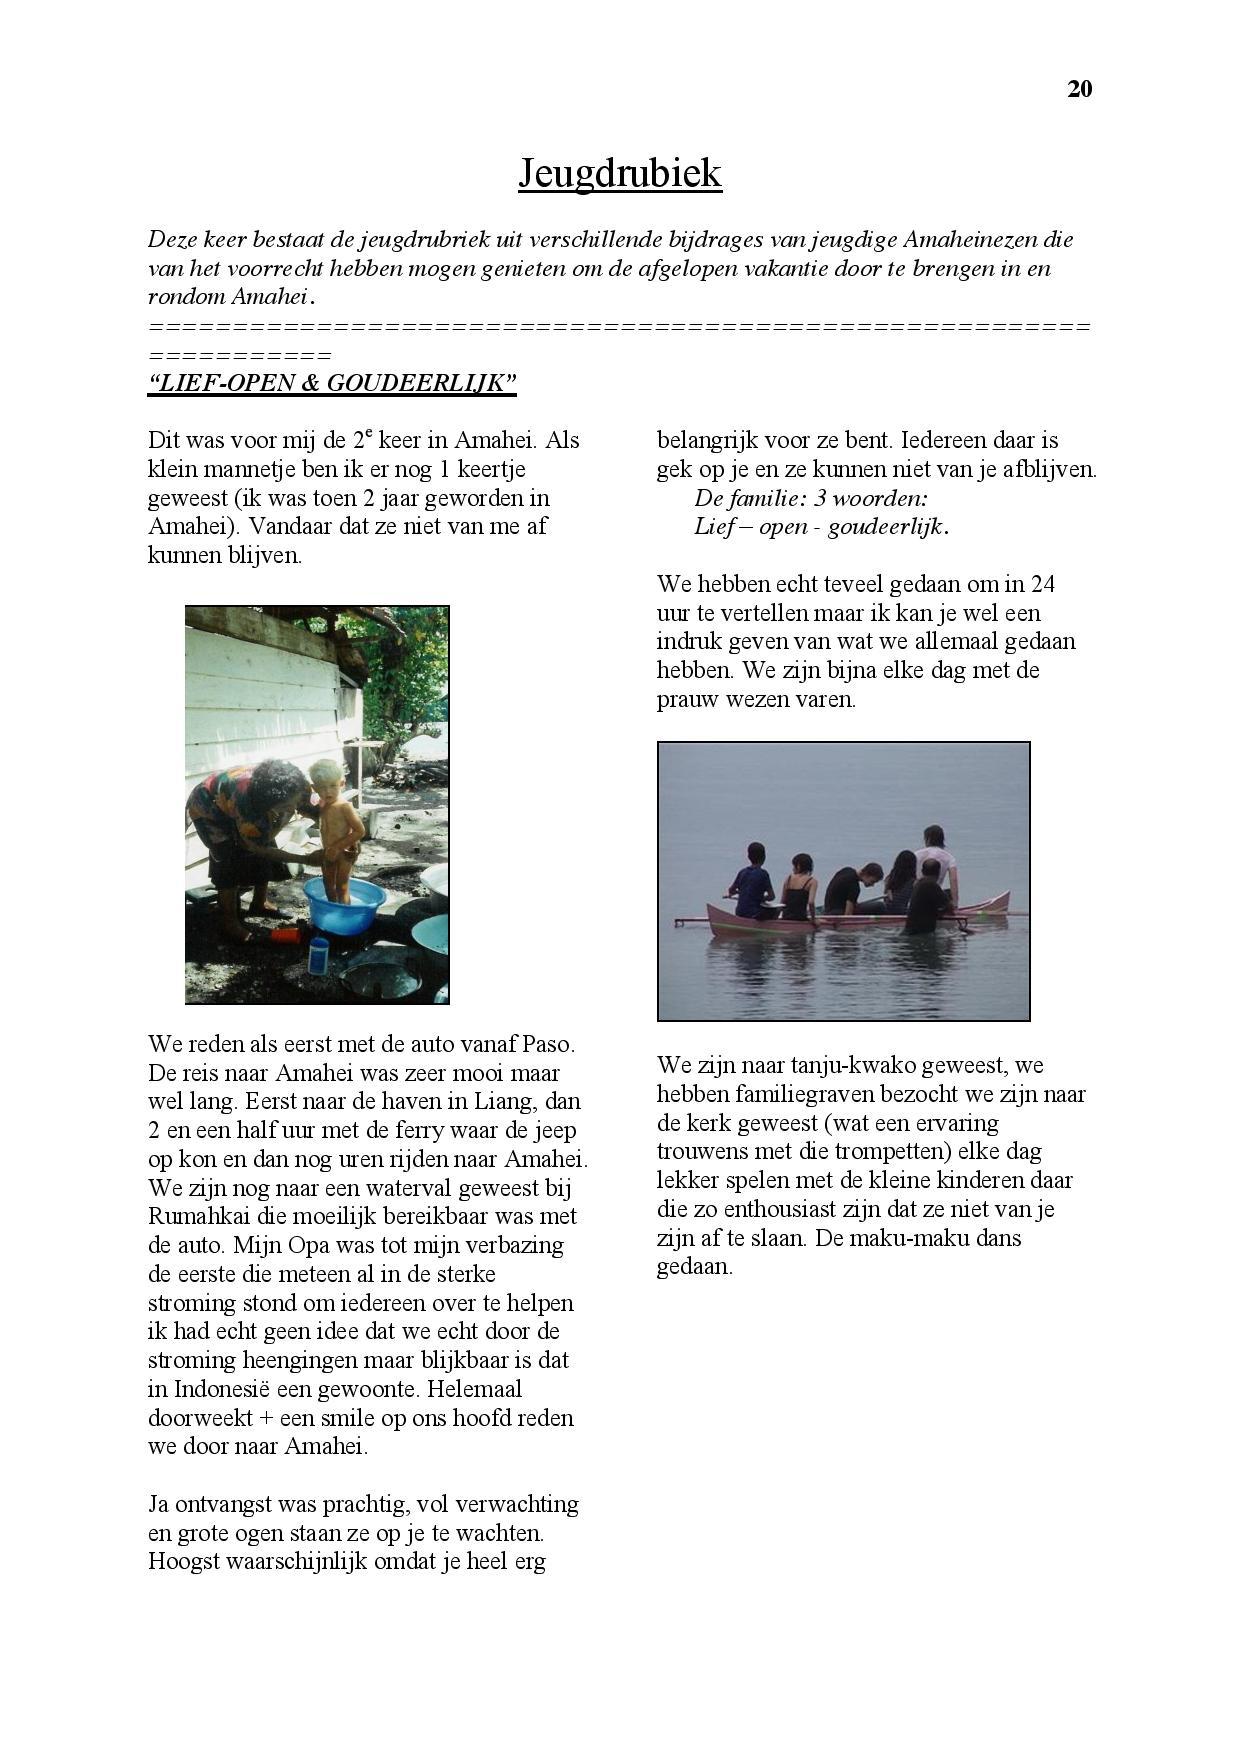 Saka Mese 3e jaargang nr. 02-2007 definitieve webversie-page-020